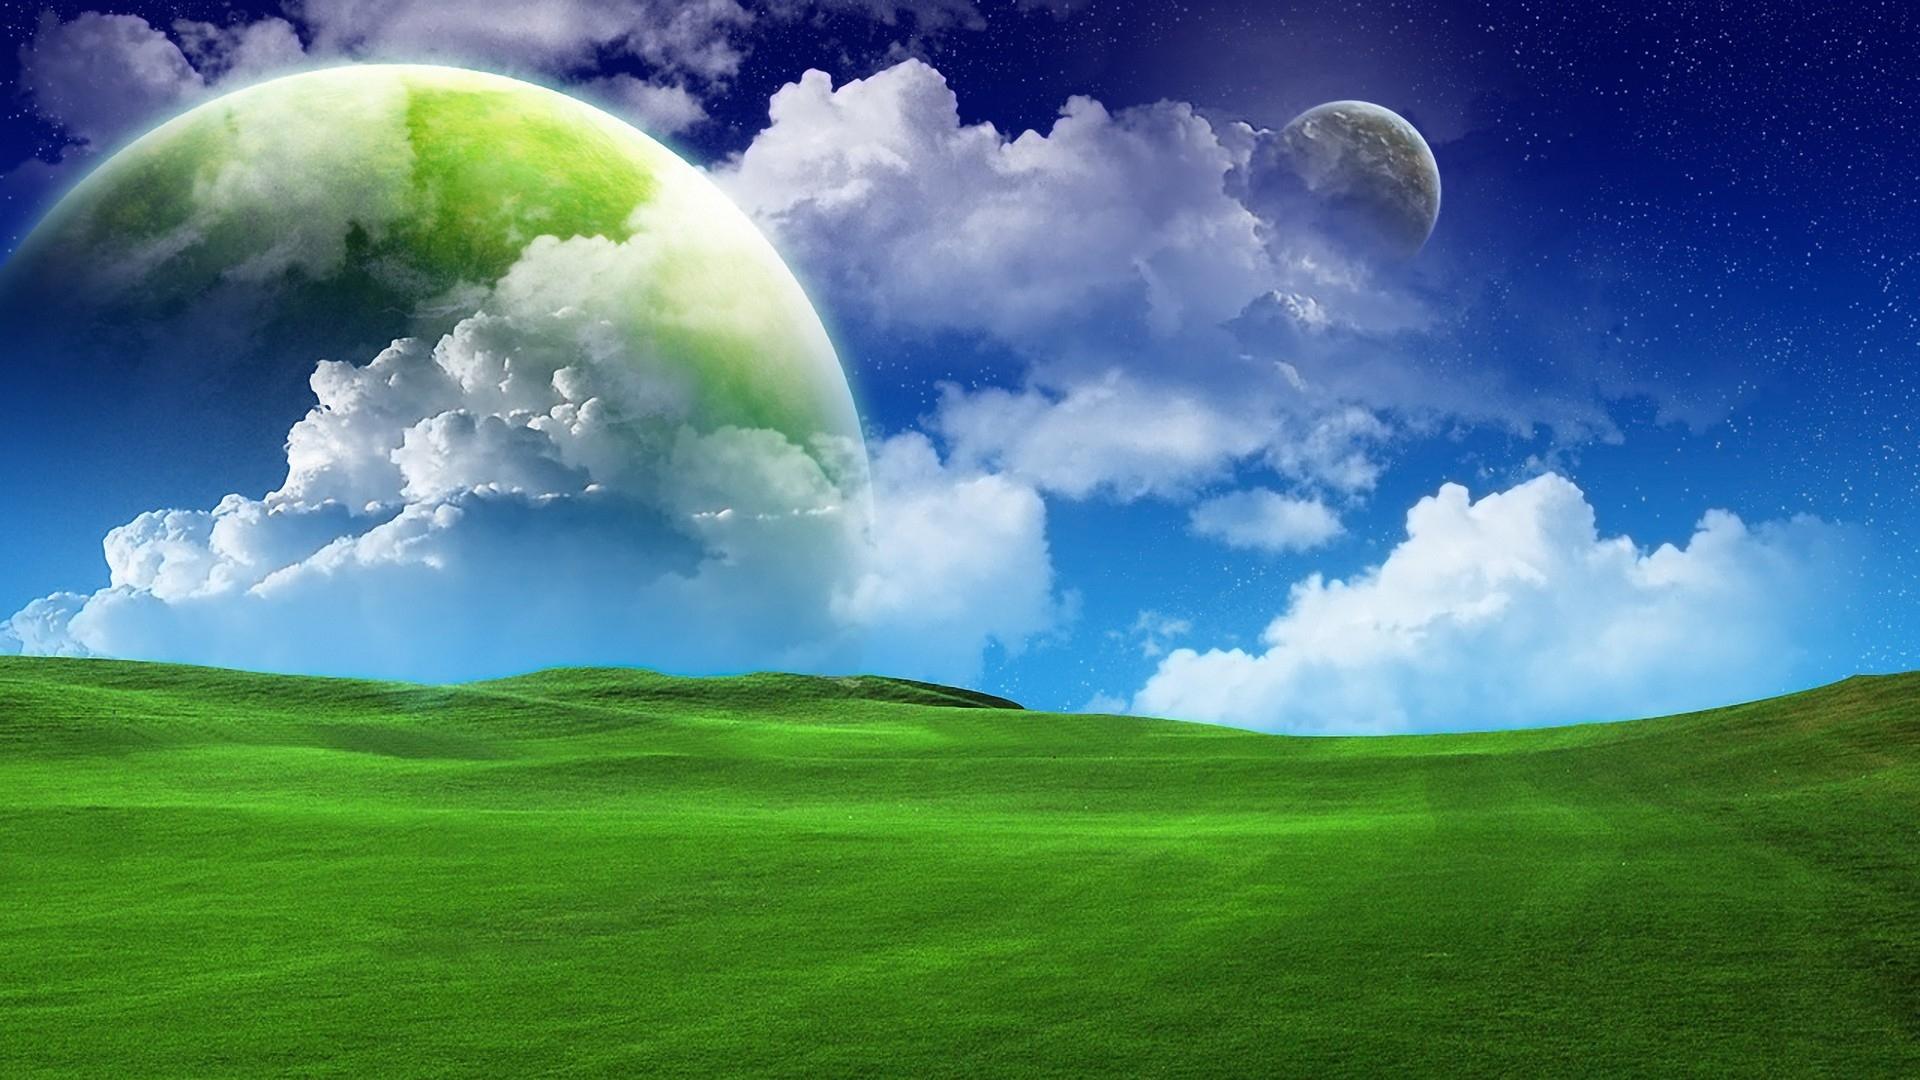 download Green Sky blue Clouds Summer Wallpaper Background 1920x1080